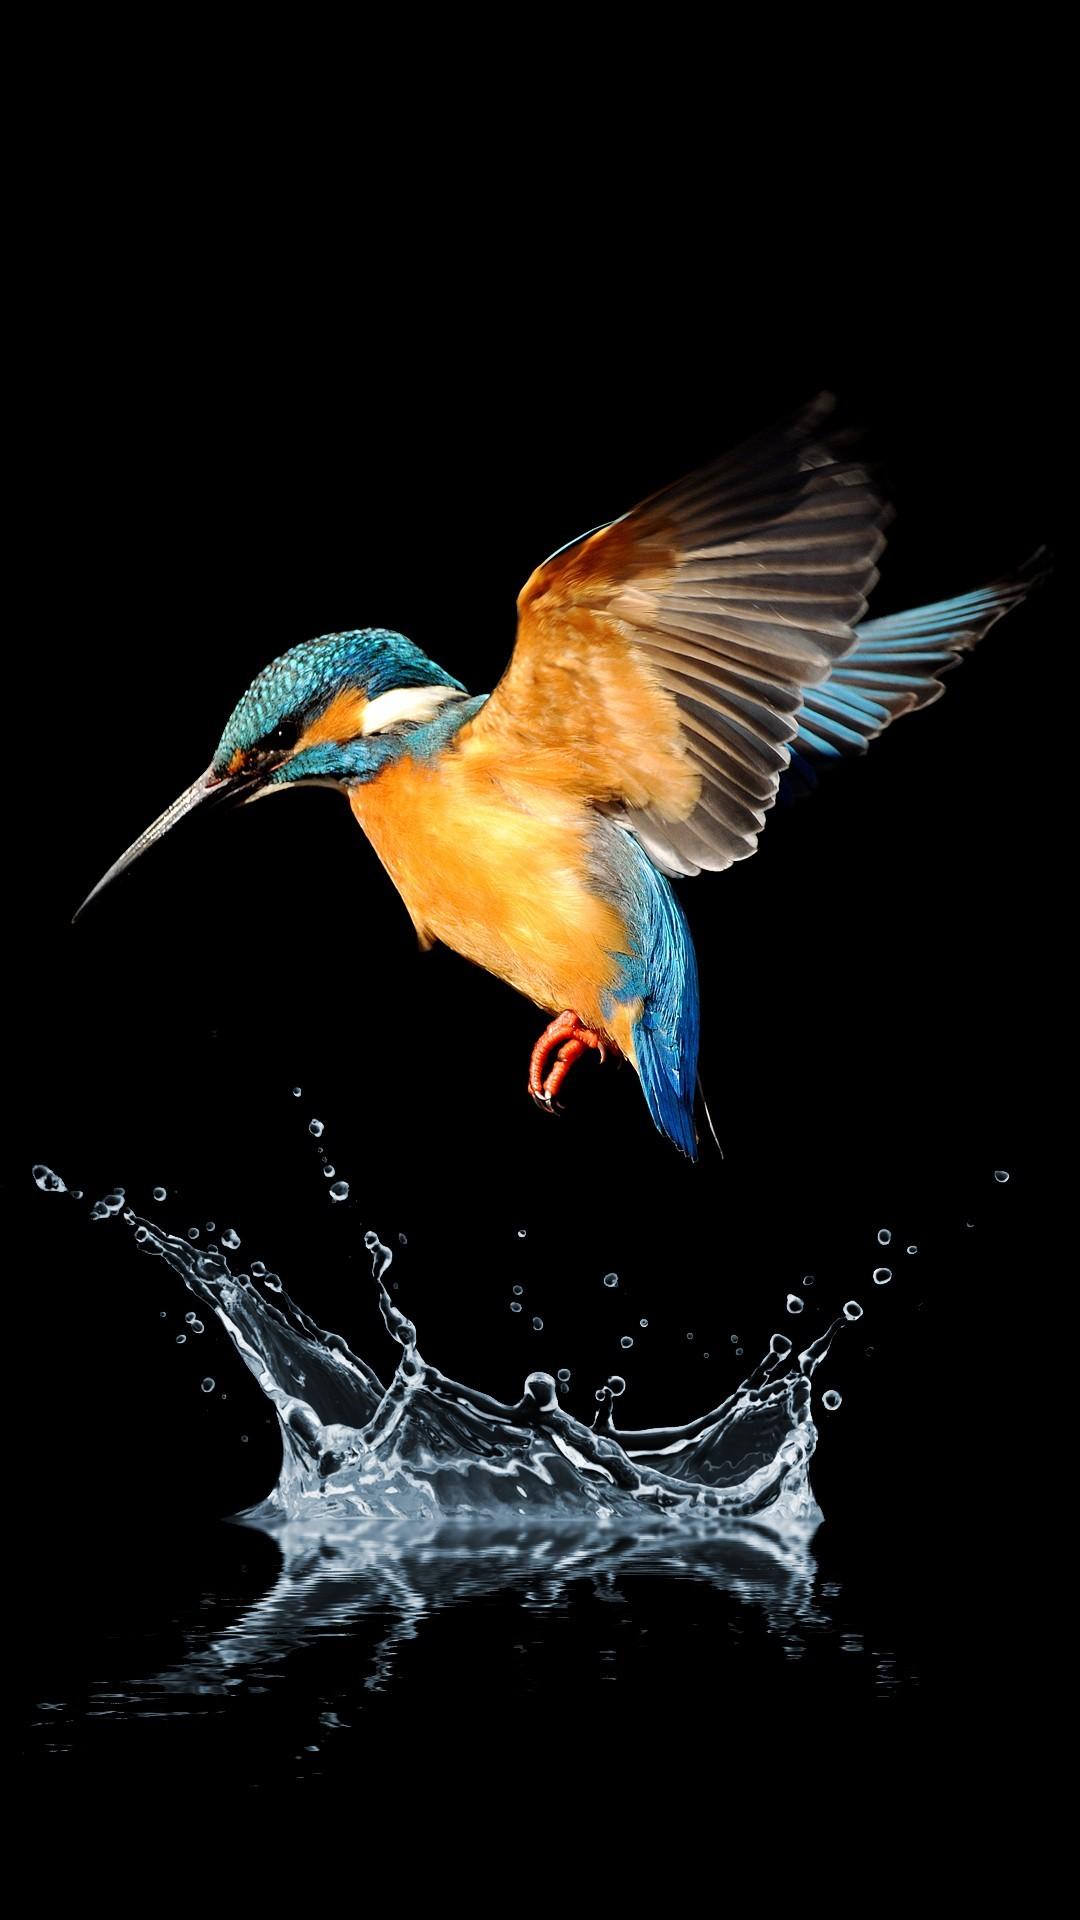 Free Blue tailed hummingbird phone wallpaper by treymoles